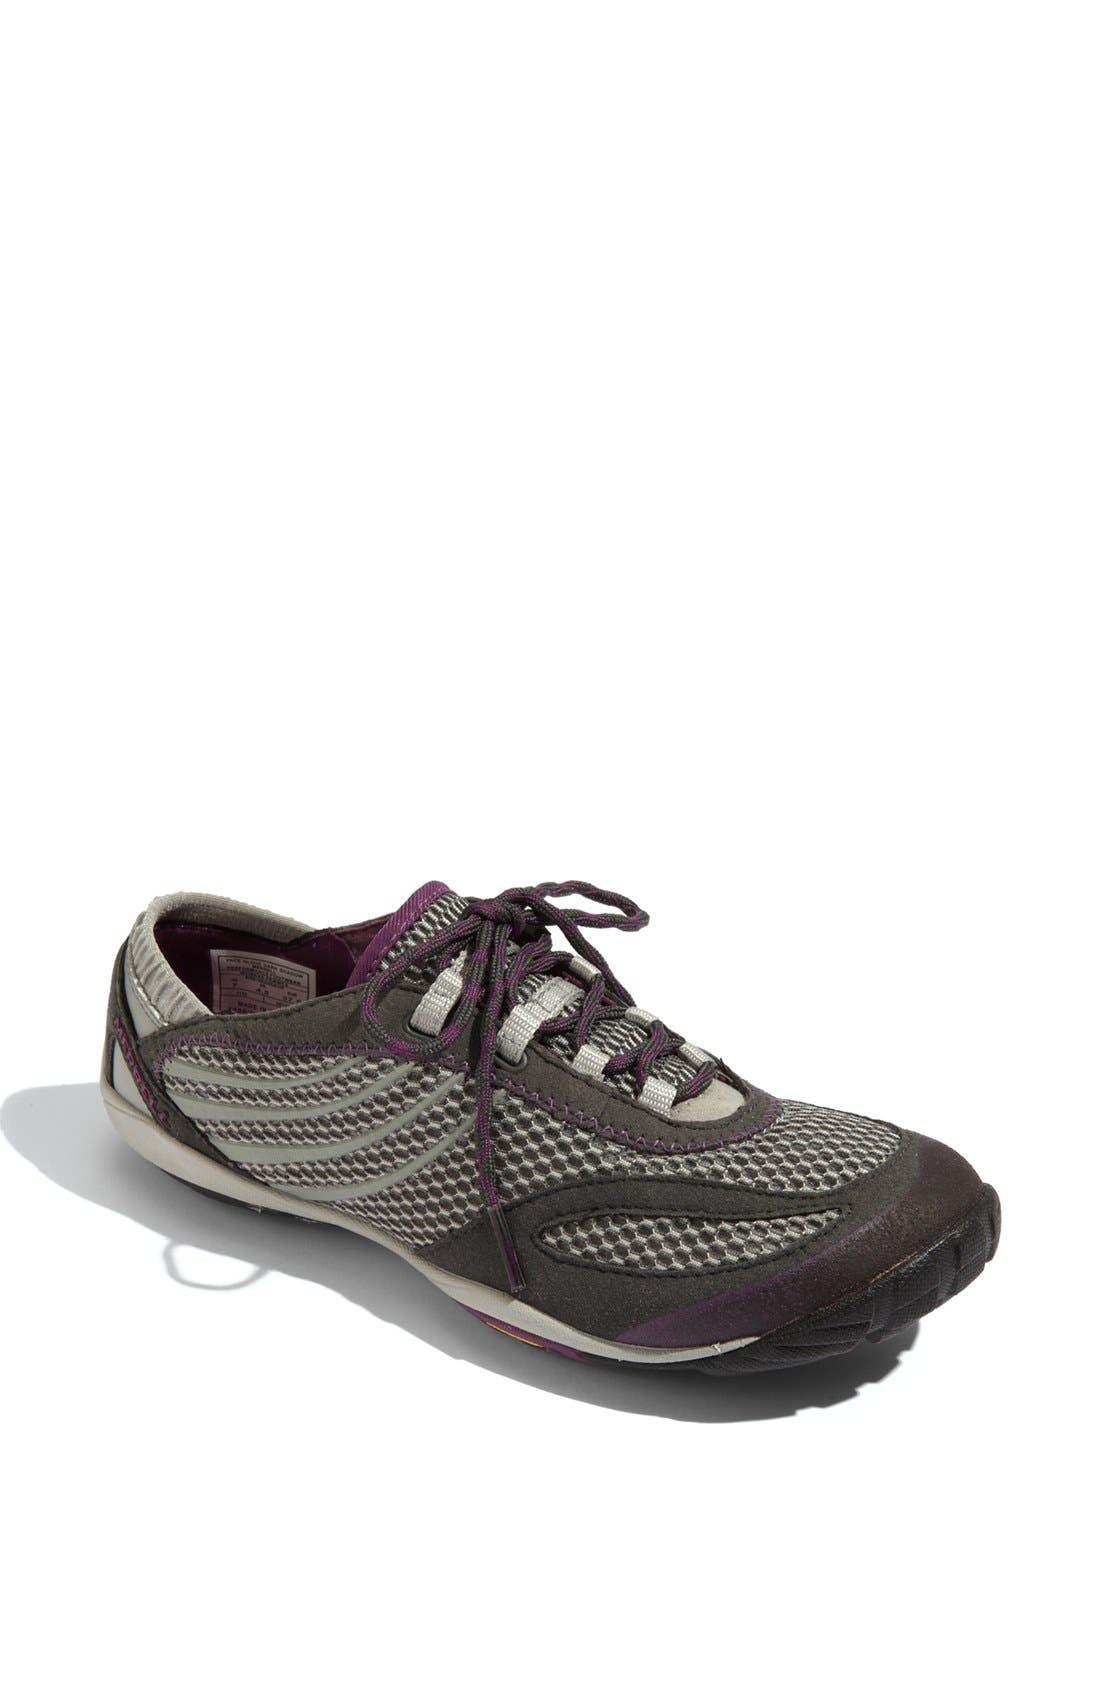 Alternate Image 1 Selected - Merrell 'Pace Minimal' Running Shoe (Women)